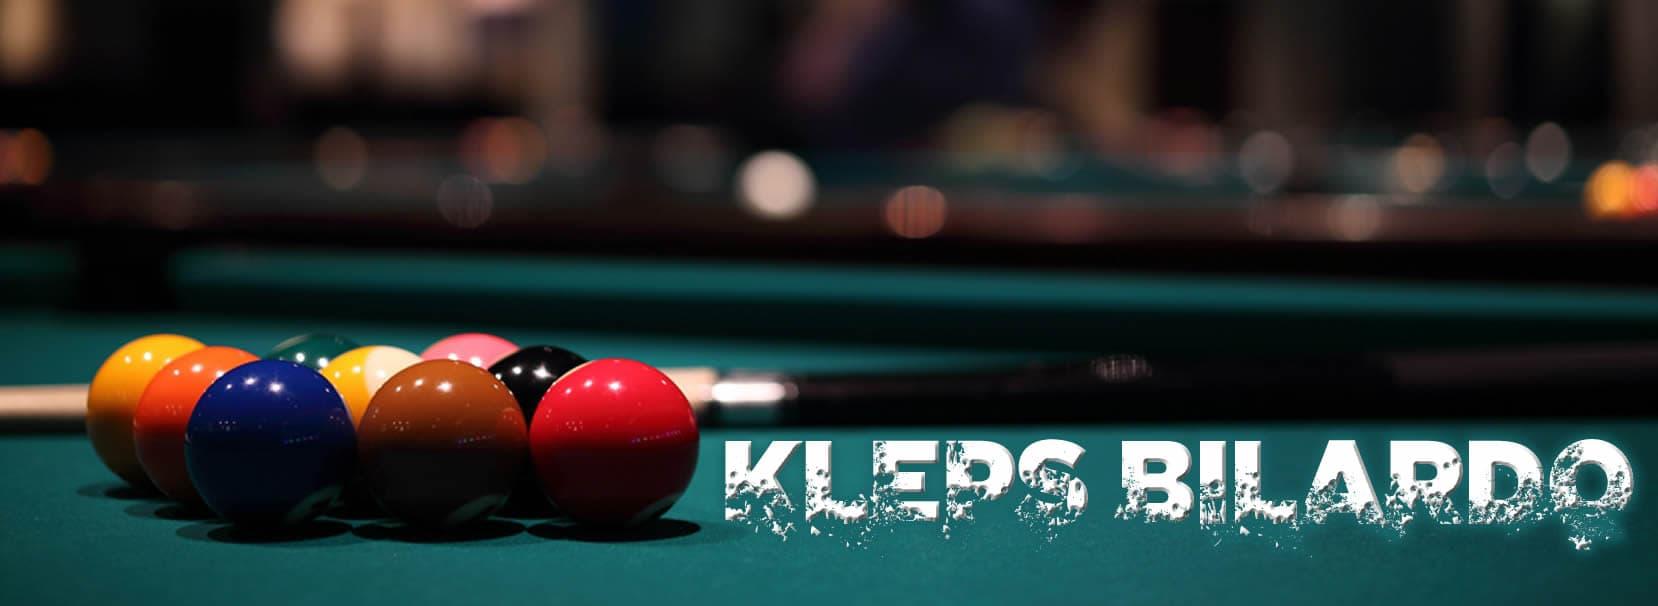 KLEPS-slider1